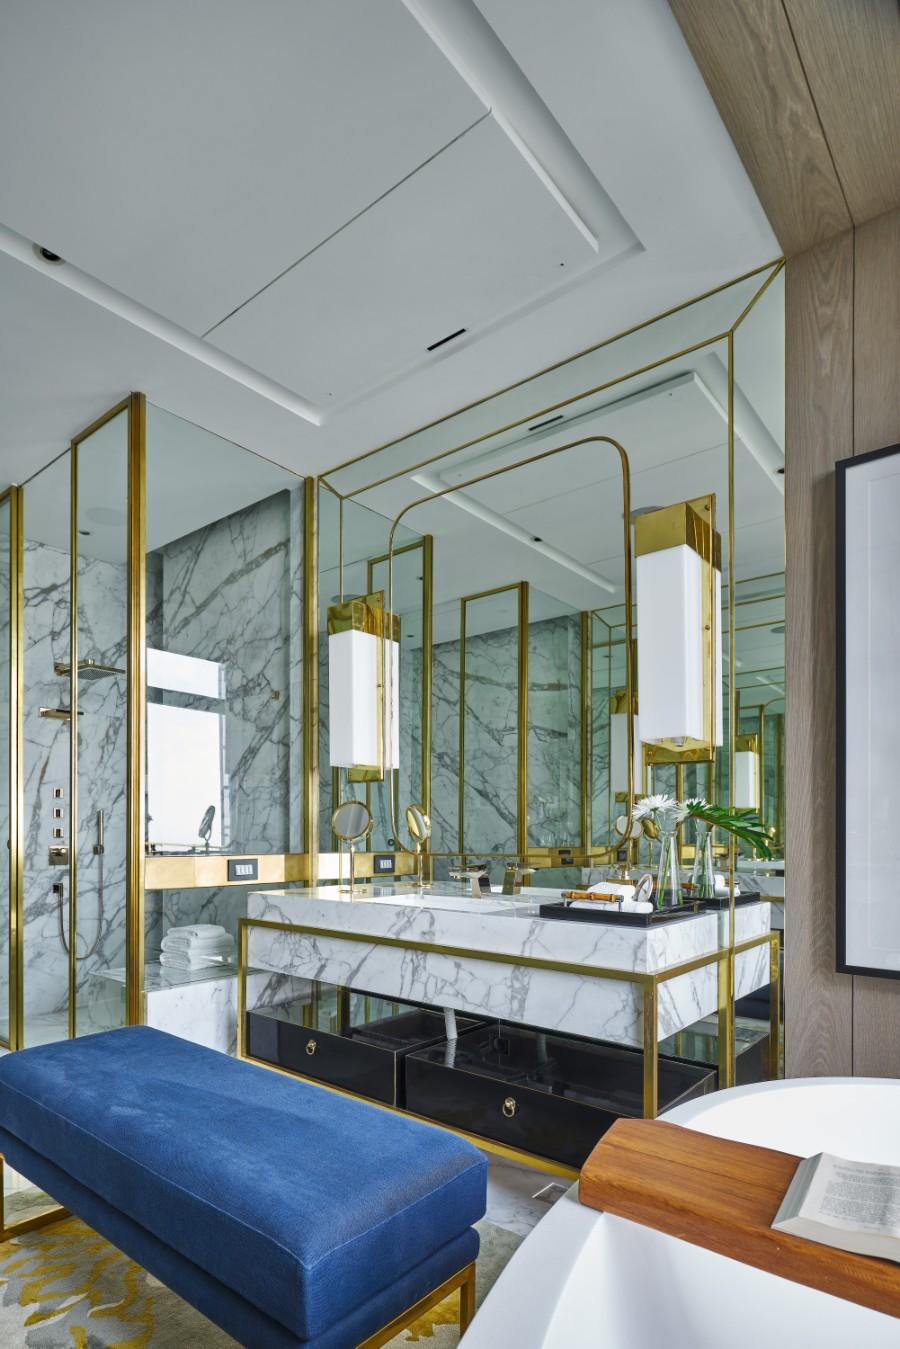 exclusive design Exclusive Design: Altamount Residence by Hirsch Bedner Associates Inside Altamount Residence by Hirsch Bedner Associates 31